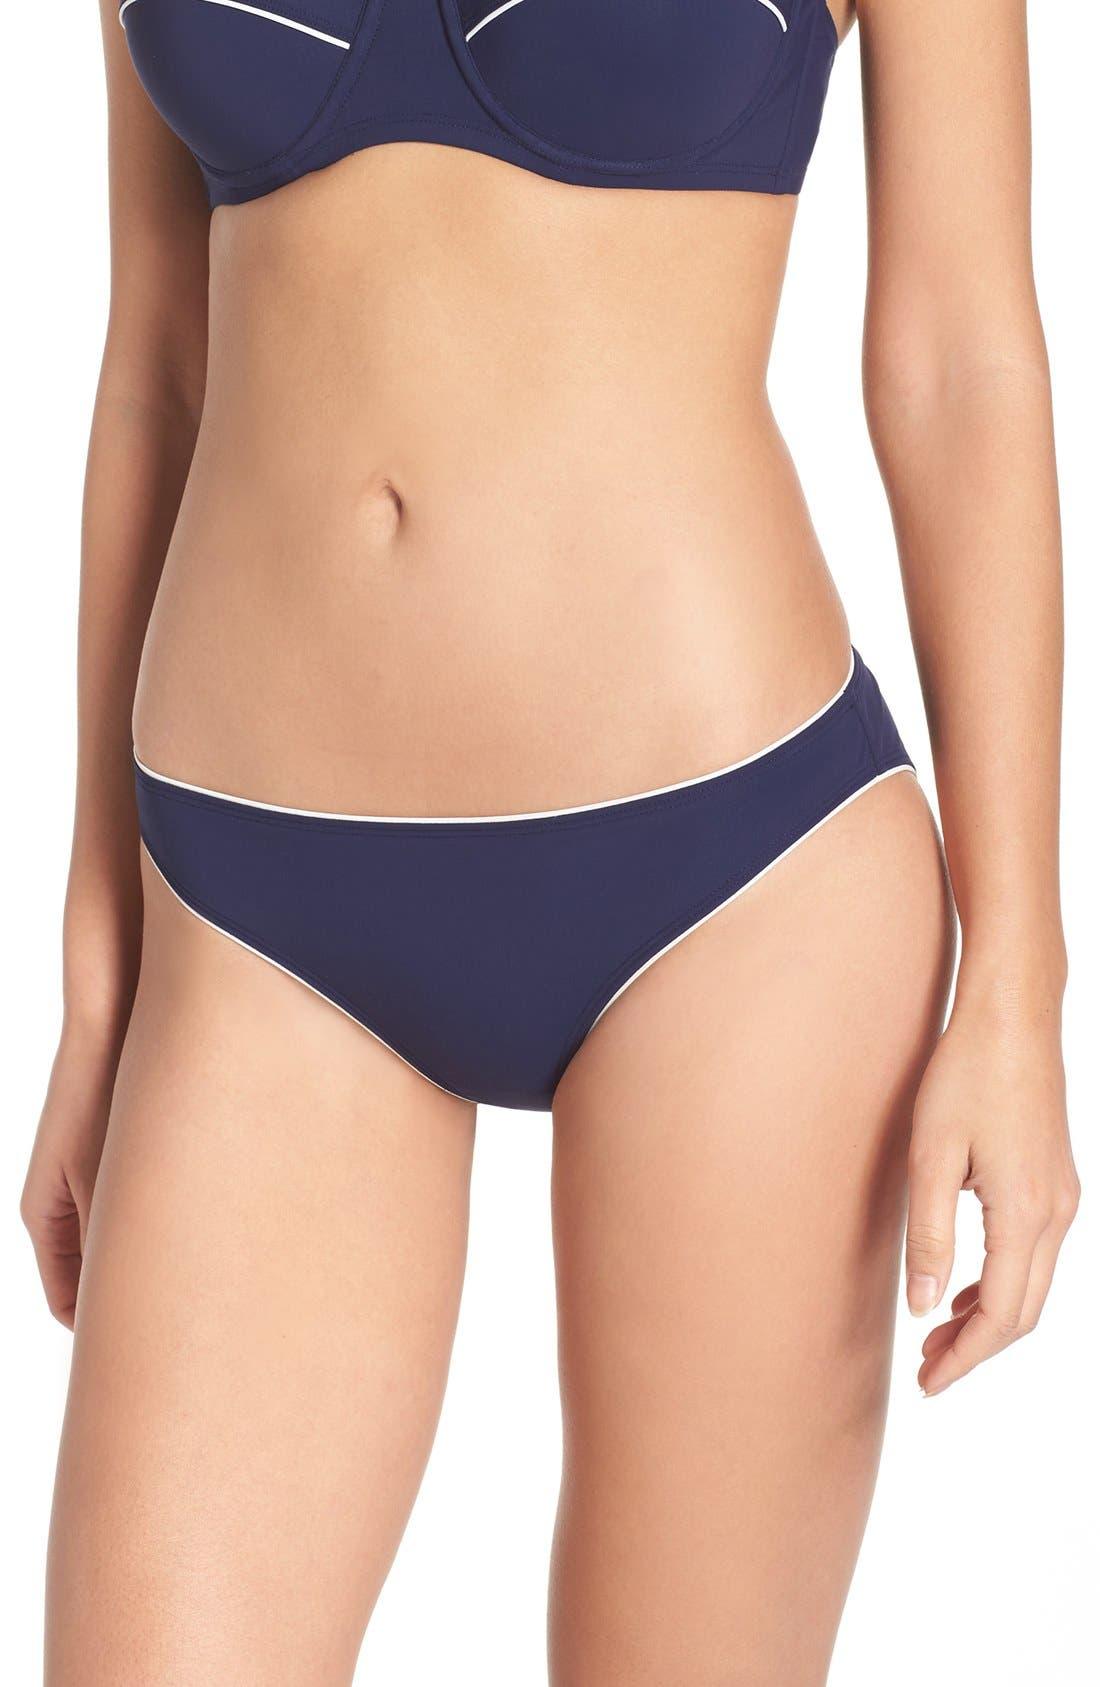 Main Image - Tory Burch Riviera Hipster Bikini Bottoms